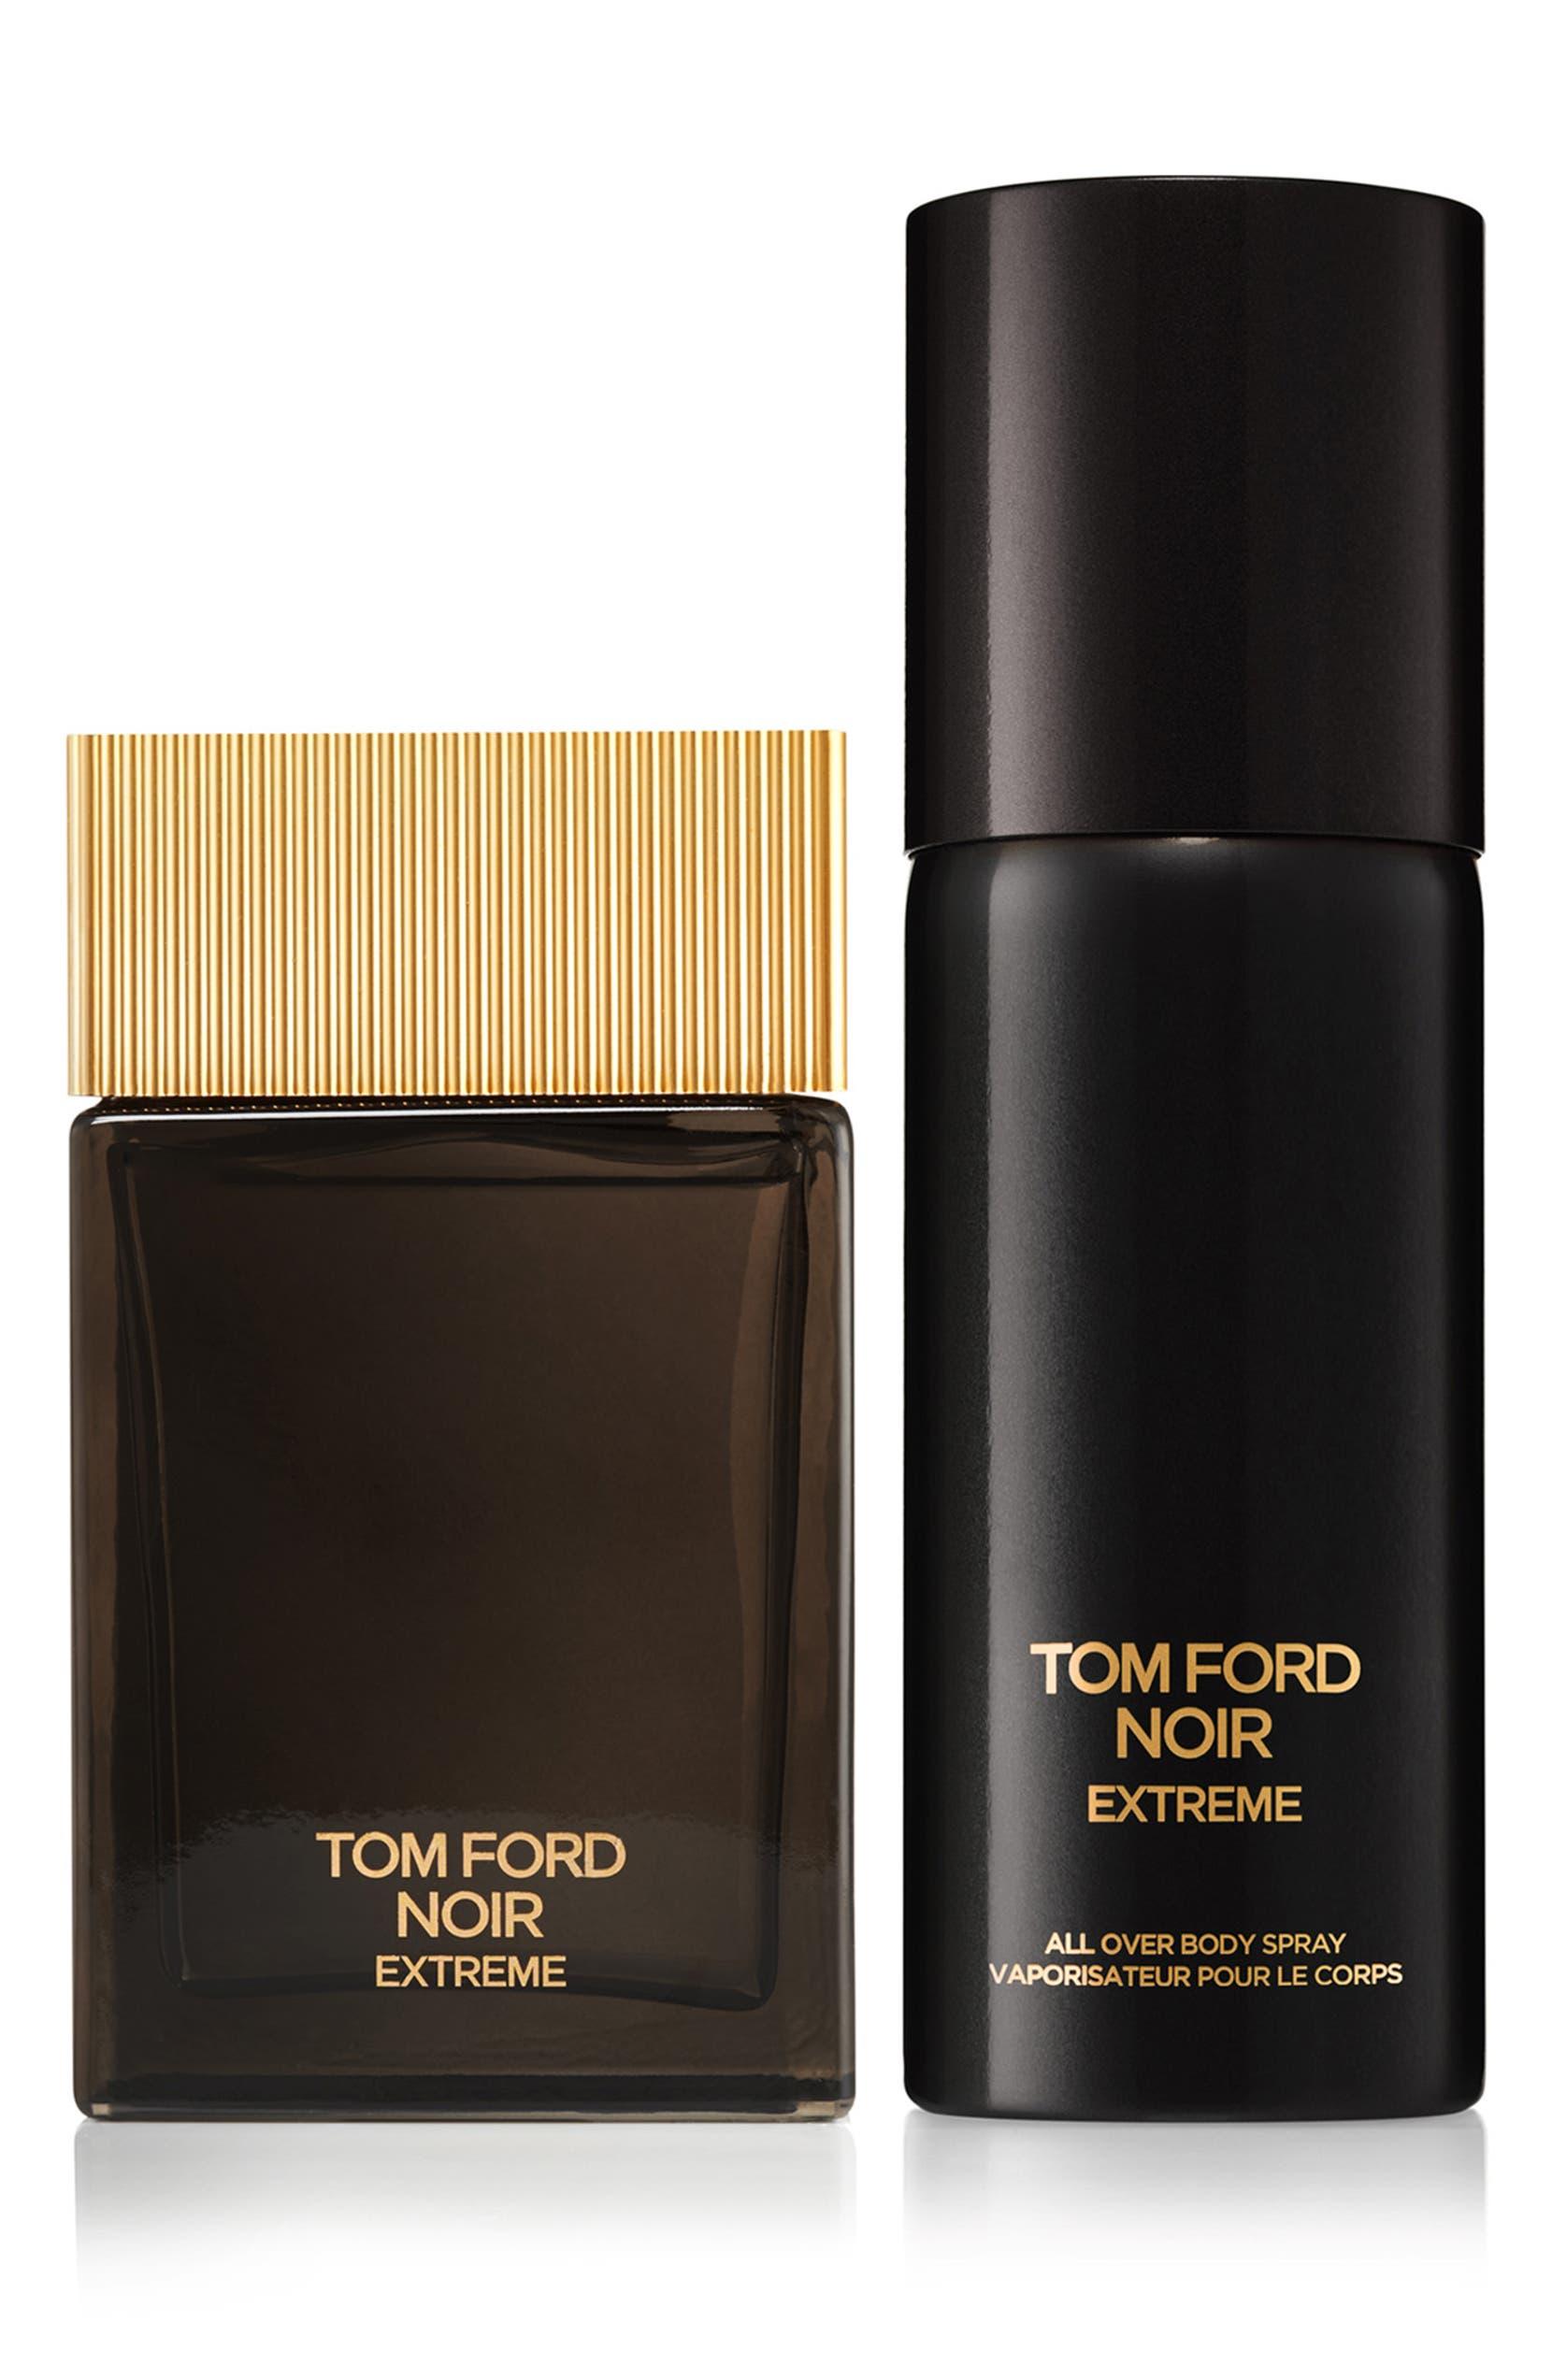 Parfumamp; Noir Set Extreme De Spray Eau Body rCBsdhQtx